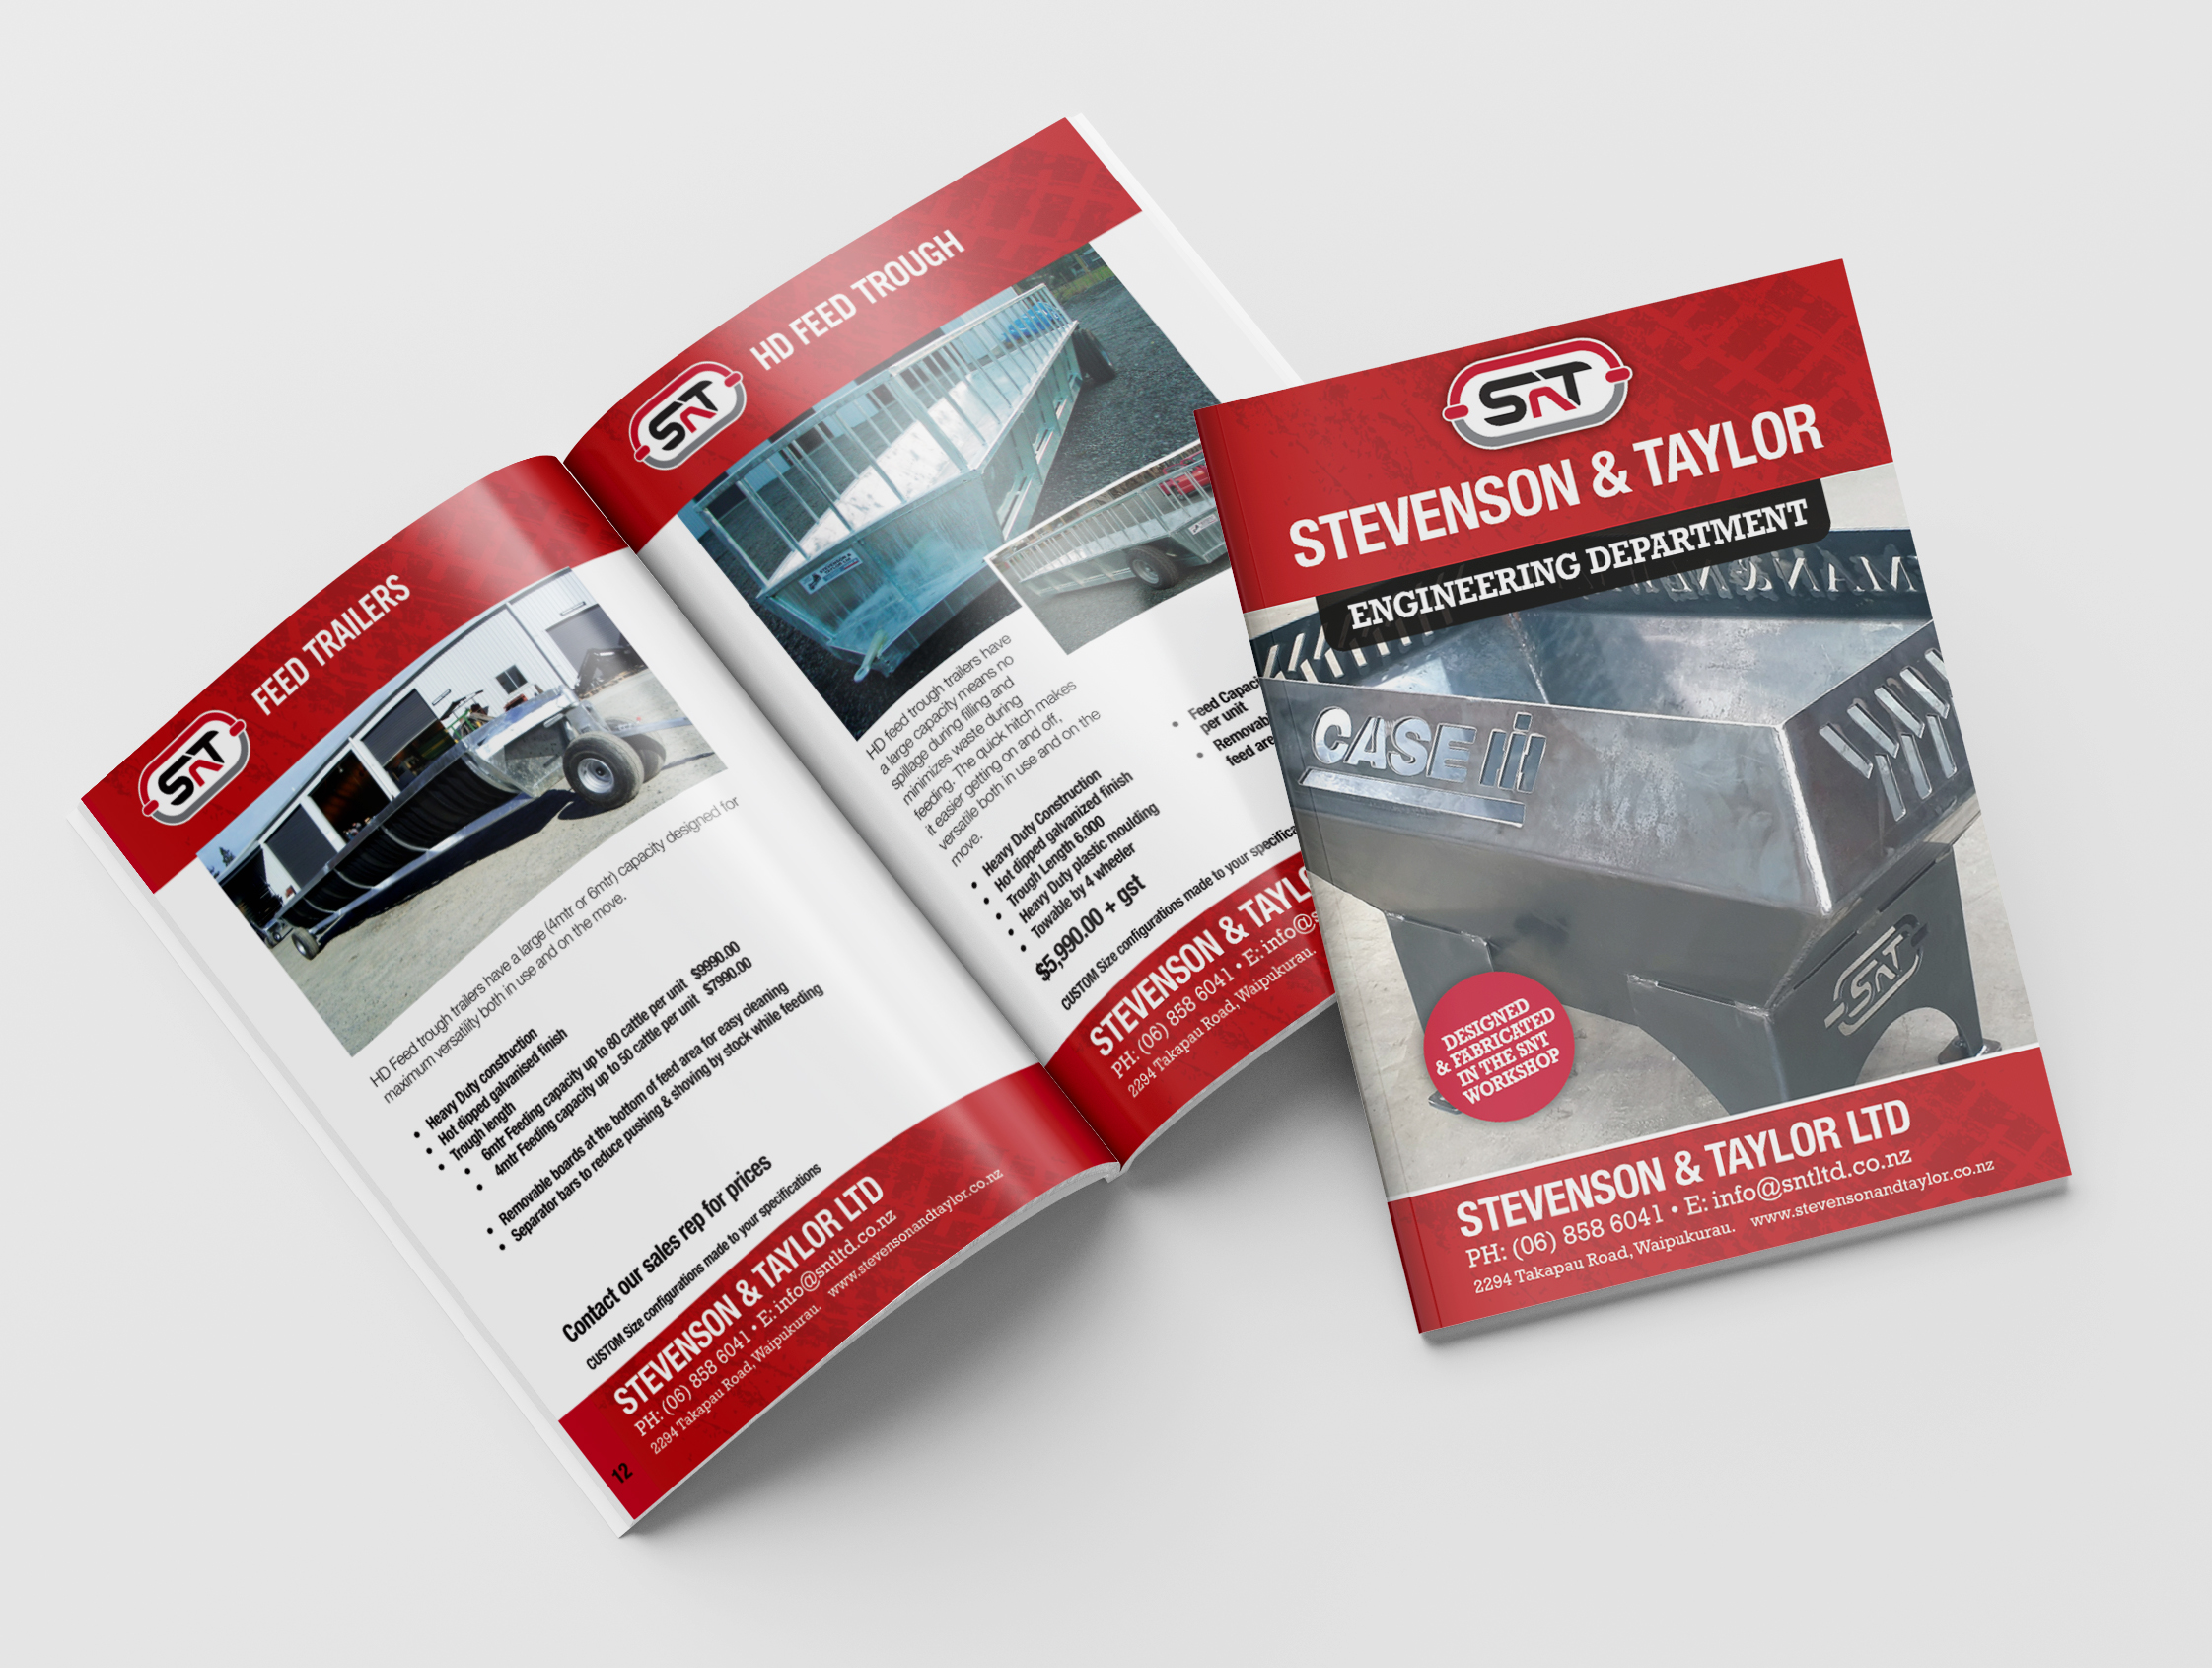 stevenson & taylor brochure